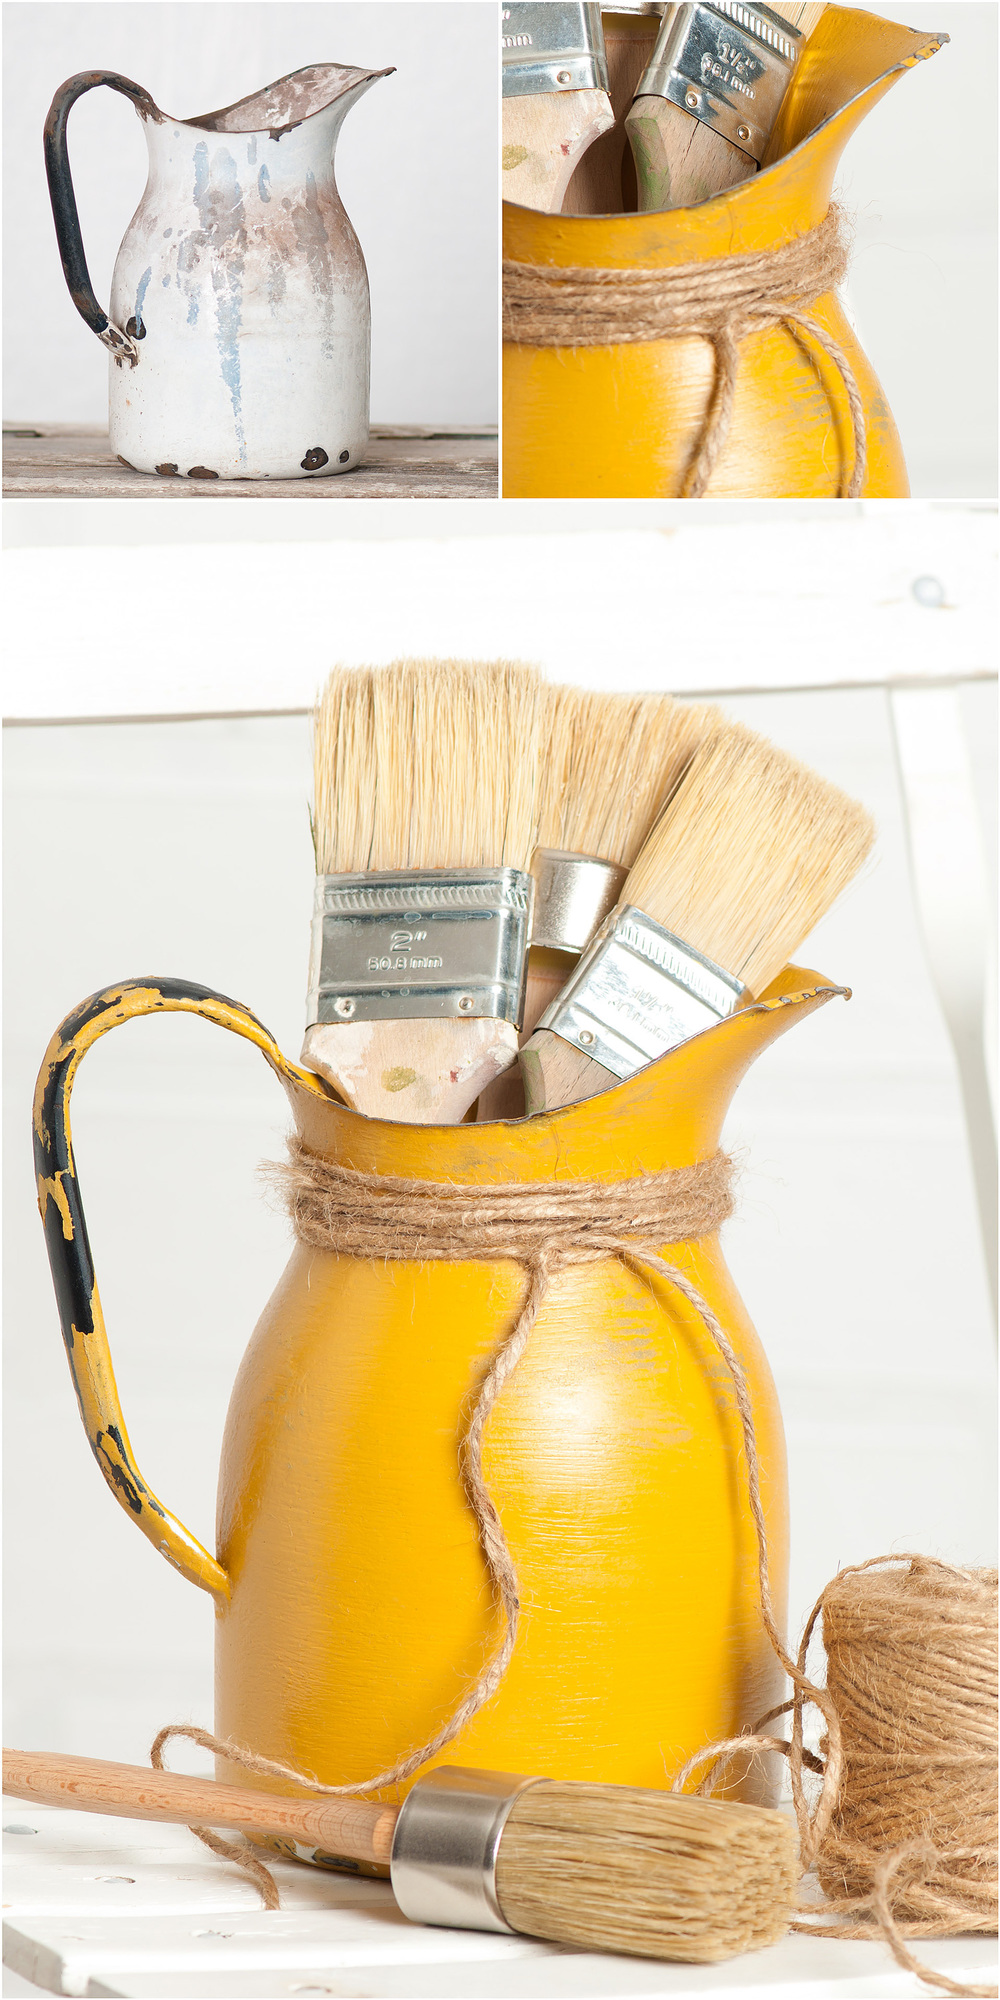 Milk paint tutorial from My Painted Door (.com) - painting on metal